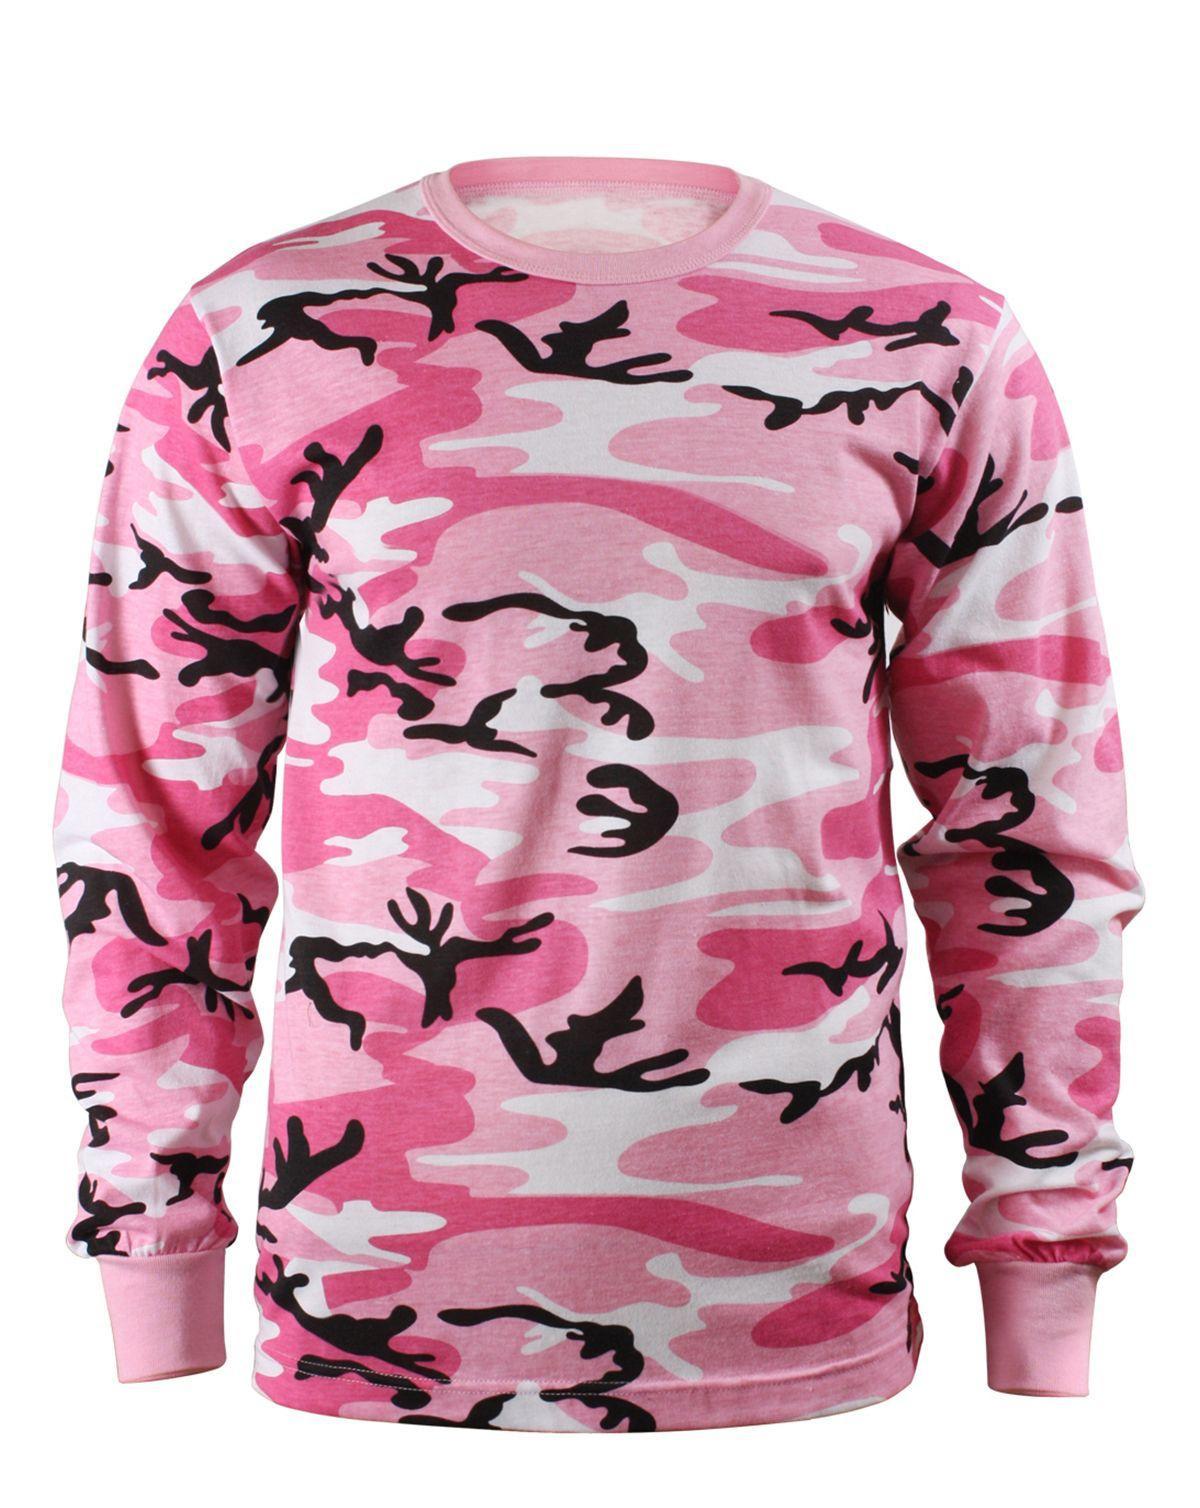 Køb Rothco Langærmet T Shirt Børn   Fri Fragt over 600  ARMY STAR